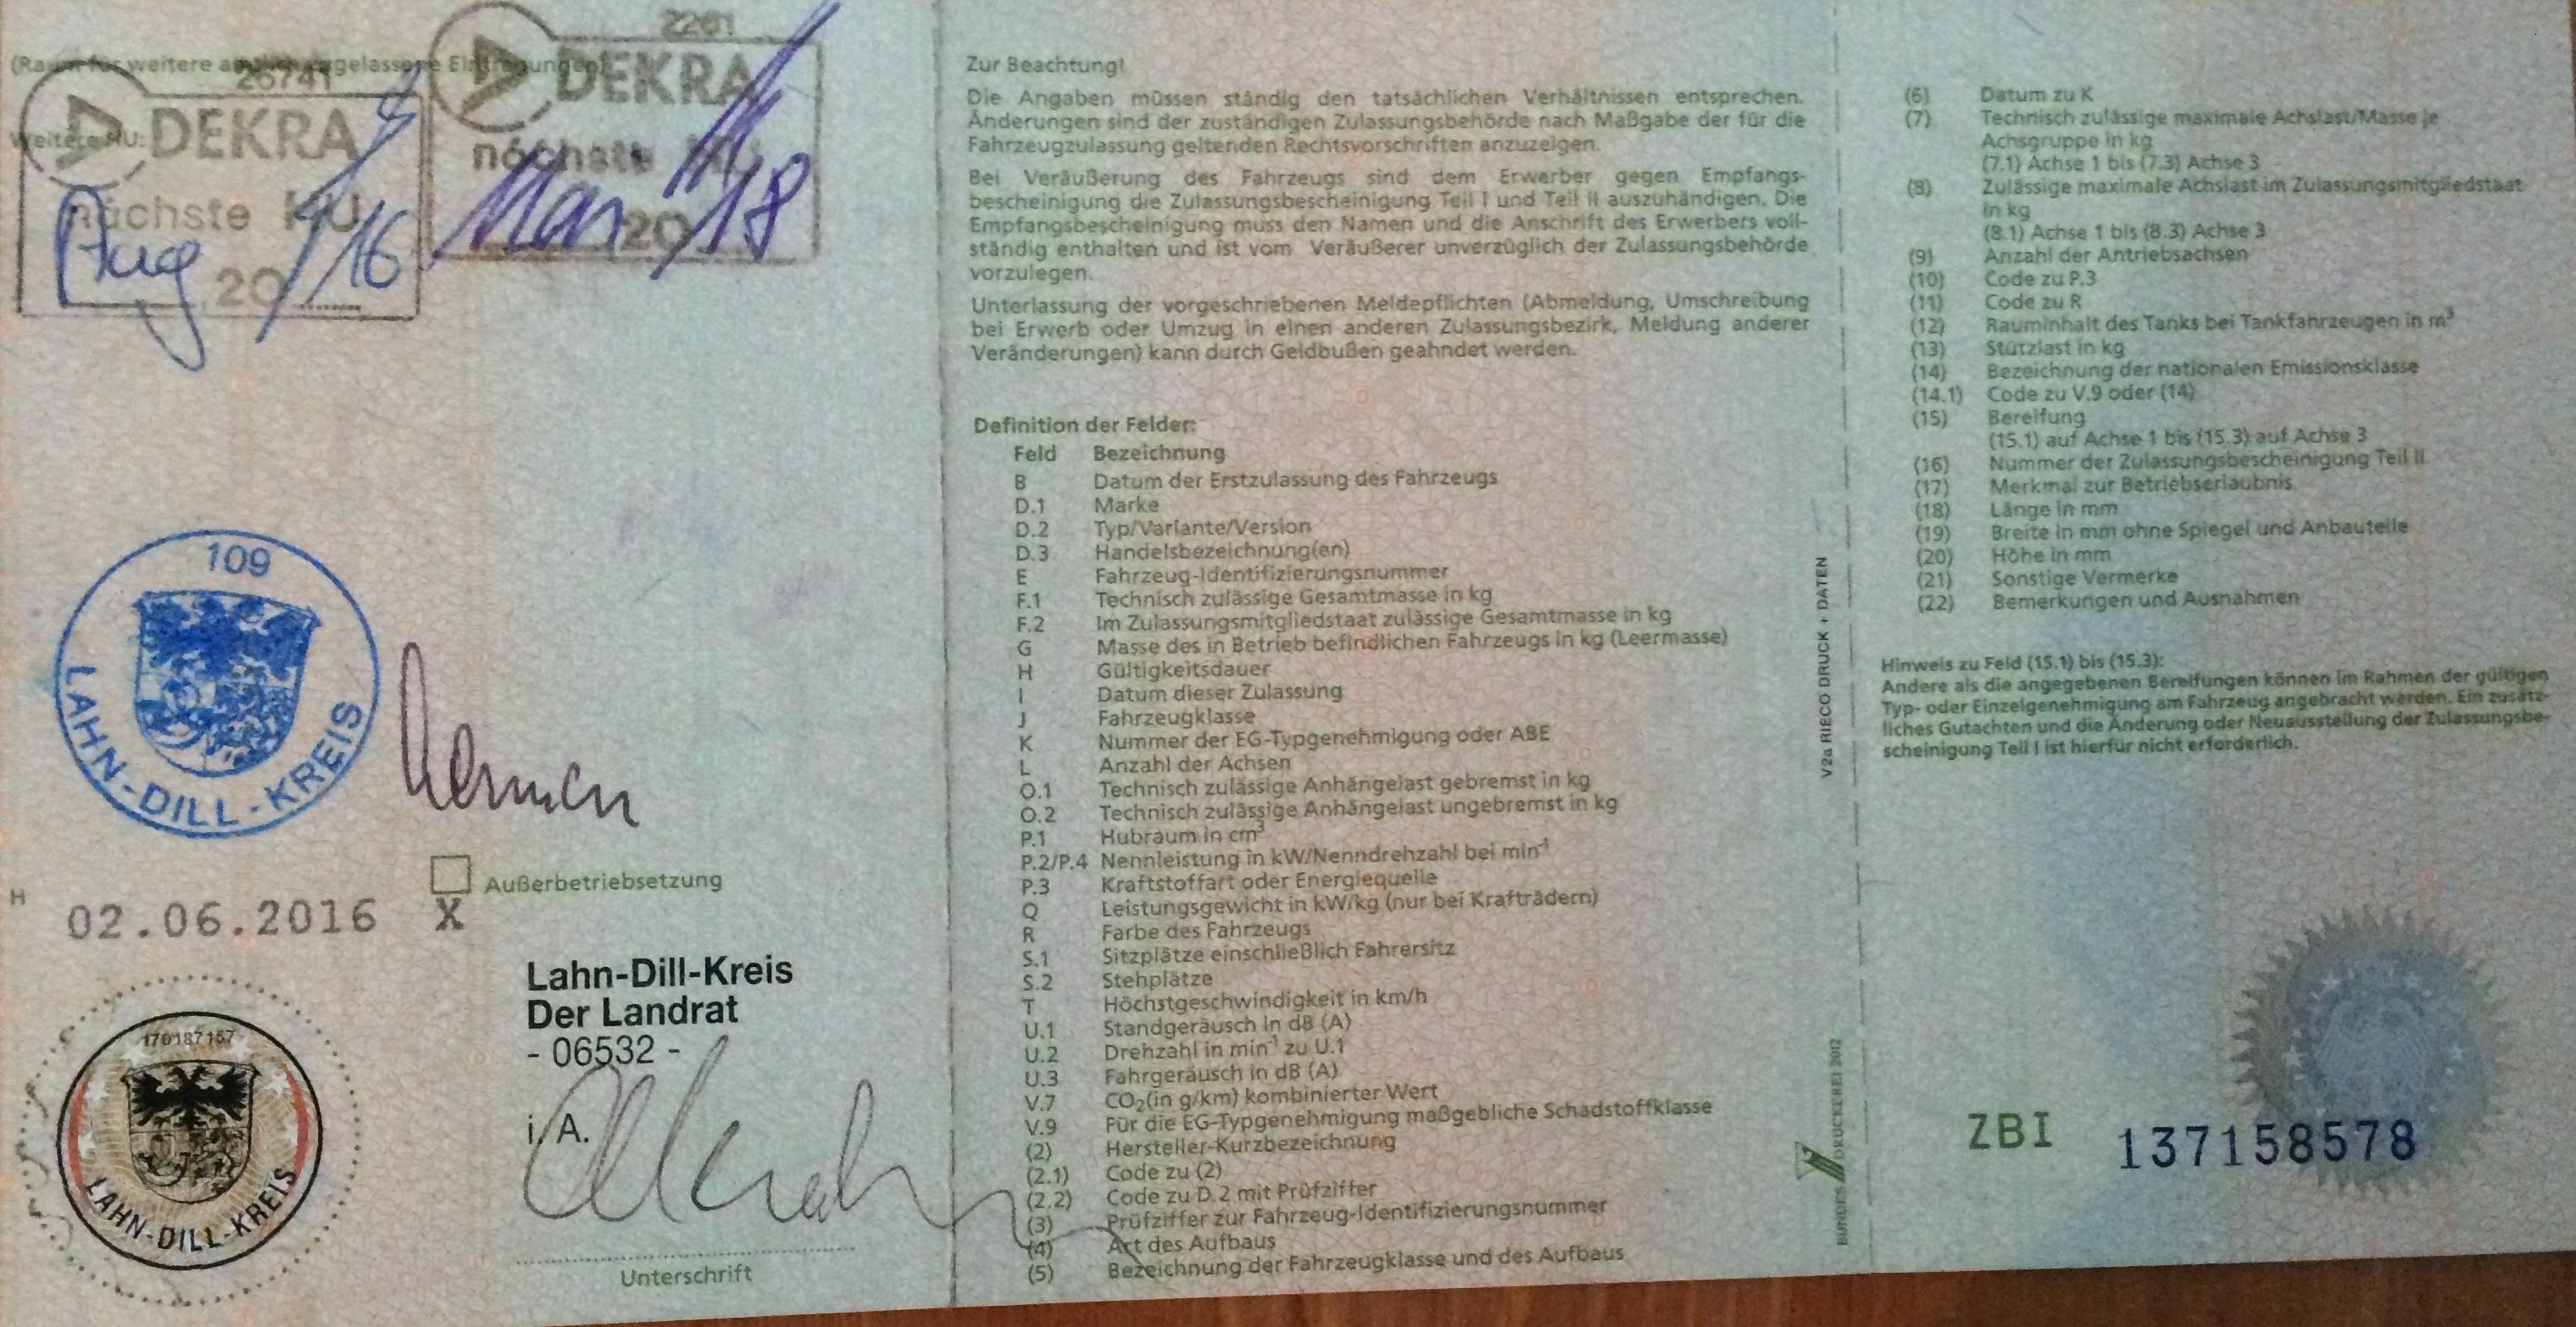 Zulassungsbescheinigung Teil I (the small registration document) Back side